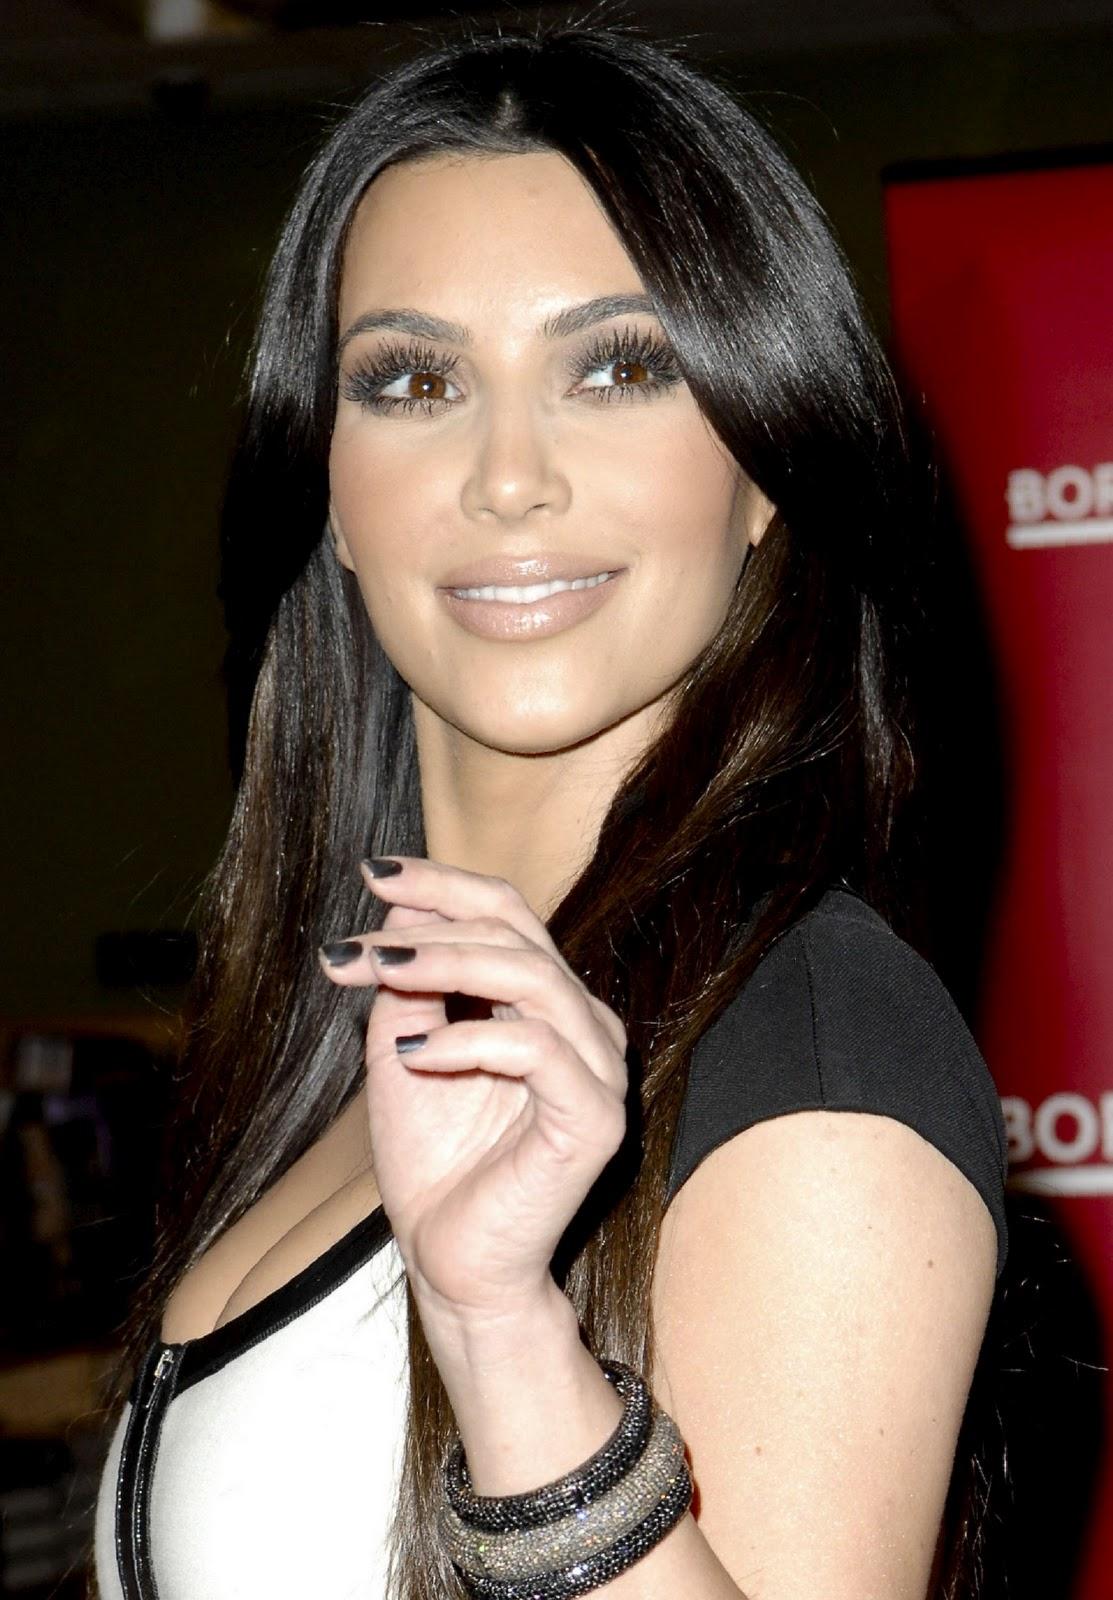 http://1.bp.blogspot.com/_0eYSn-vGnU8/TQZv1yu6TwI/AAAAAAAABMo/c9k22WYOUxw/s1600/kim_kardashian_nice_cleavage_10.jpg